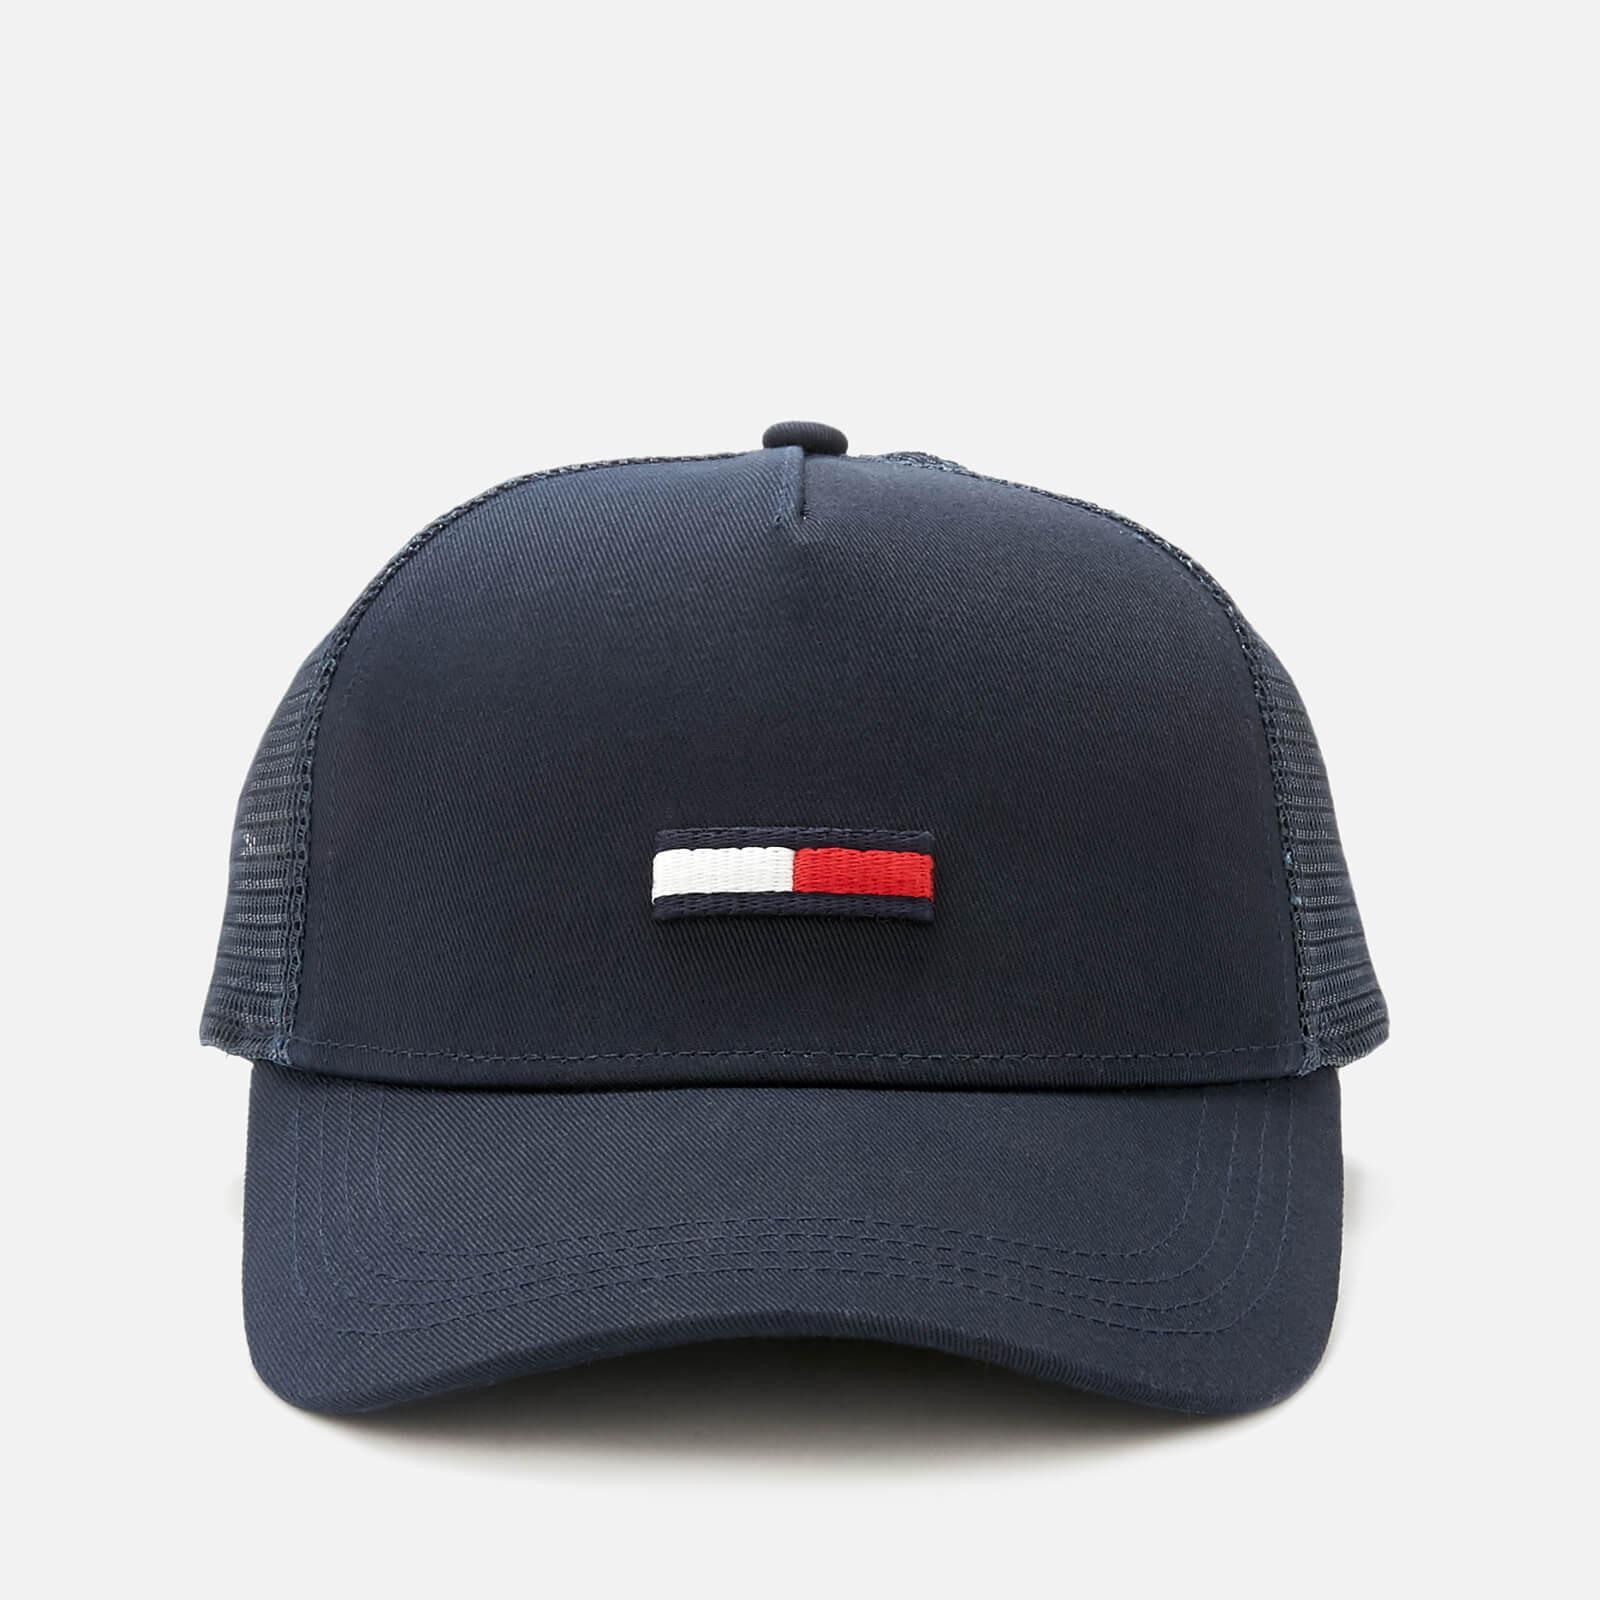 59911974a751 Tommy Hilfiger Trucker Cap in Blue for Men - Lyst